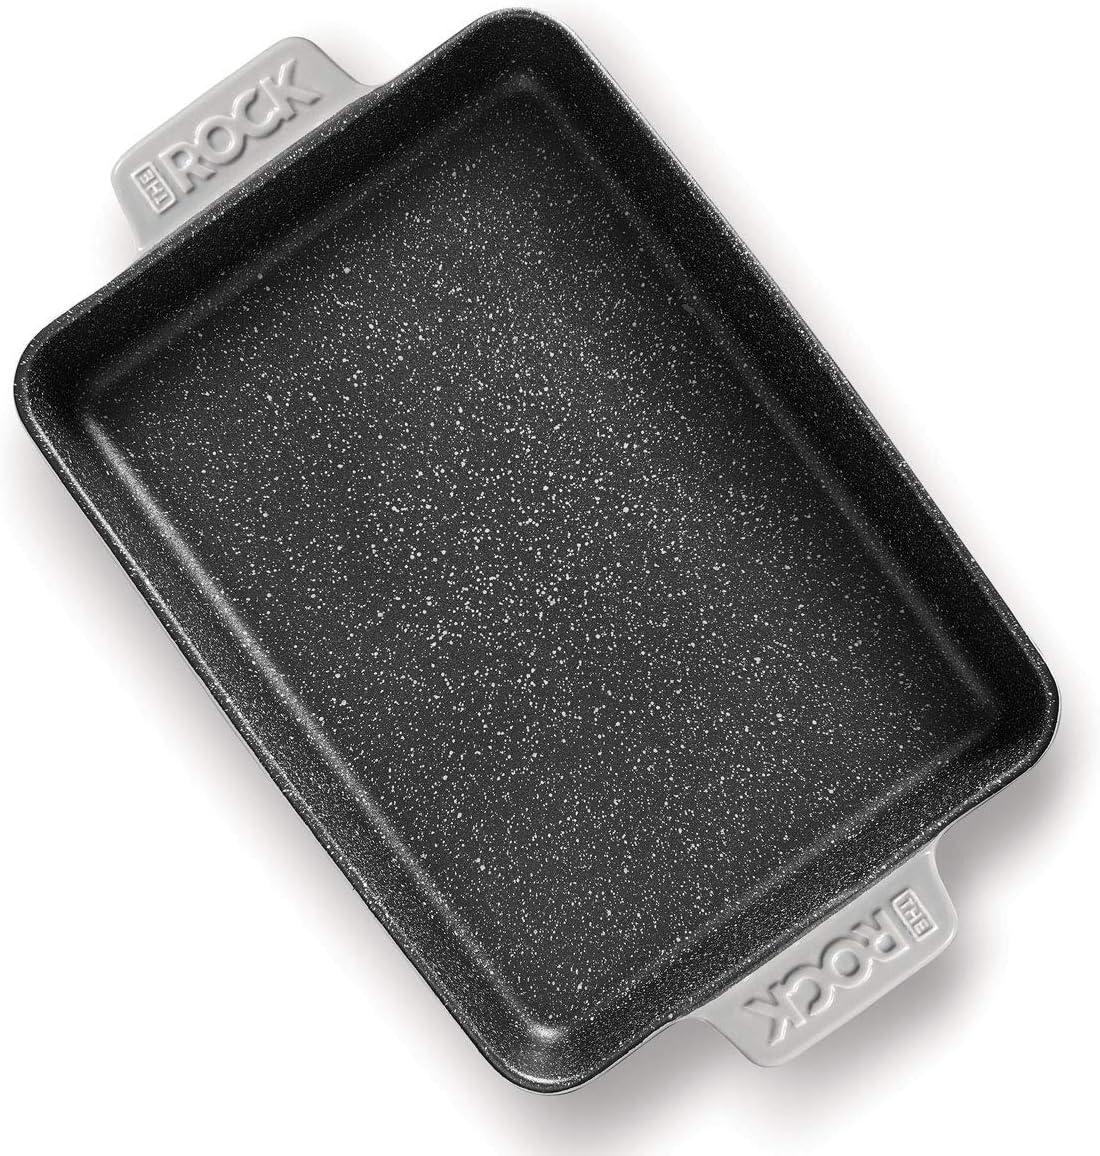 Starfrit 034387-004-0000 Starfrit The Rock Ceramic Ovenware Rectangular Dish 13 x 9 Grey